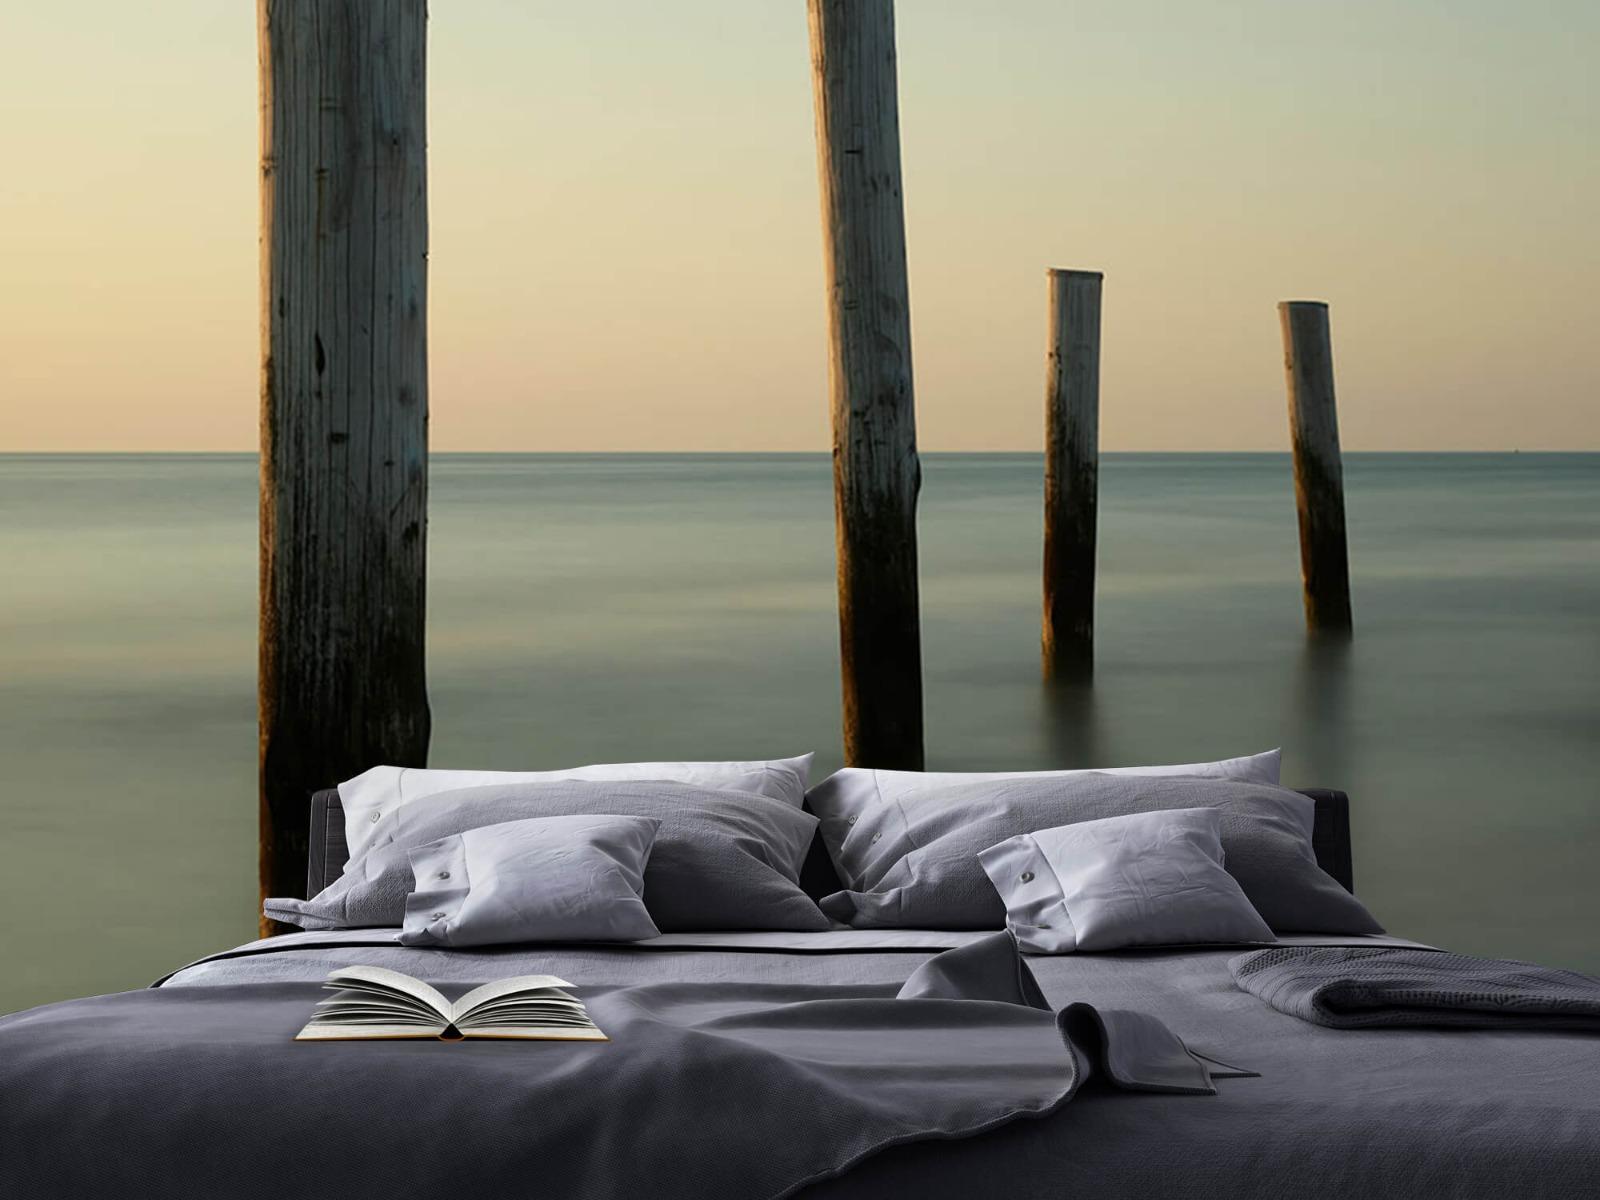 Zeeën en Oceanen - Houten strandpalen - Slaapkamer 18